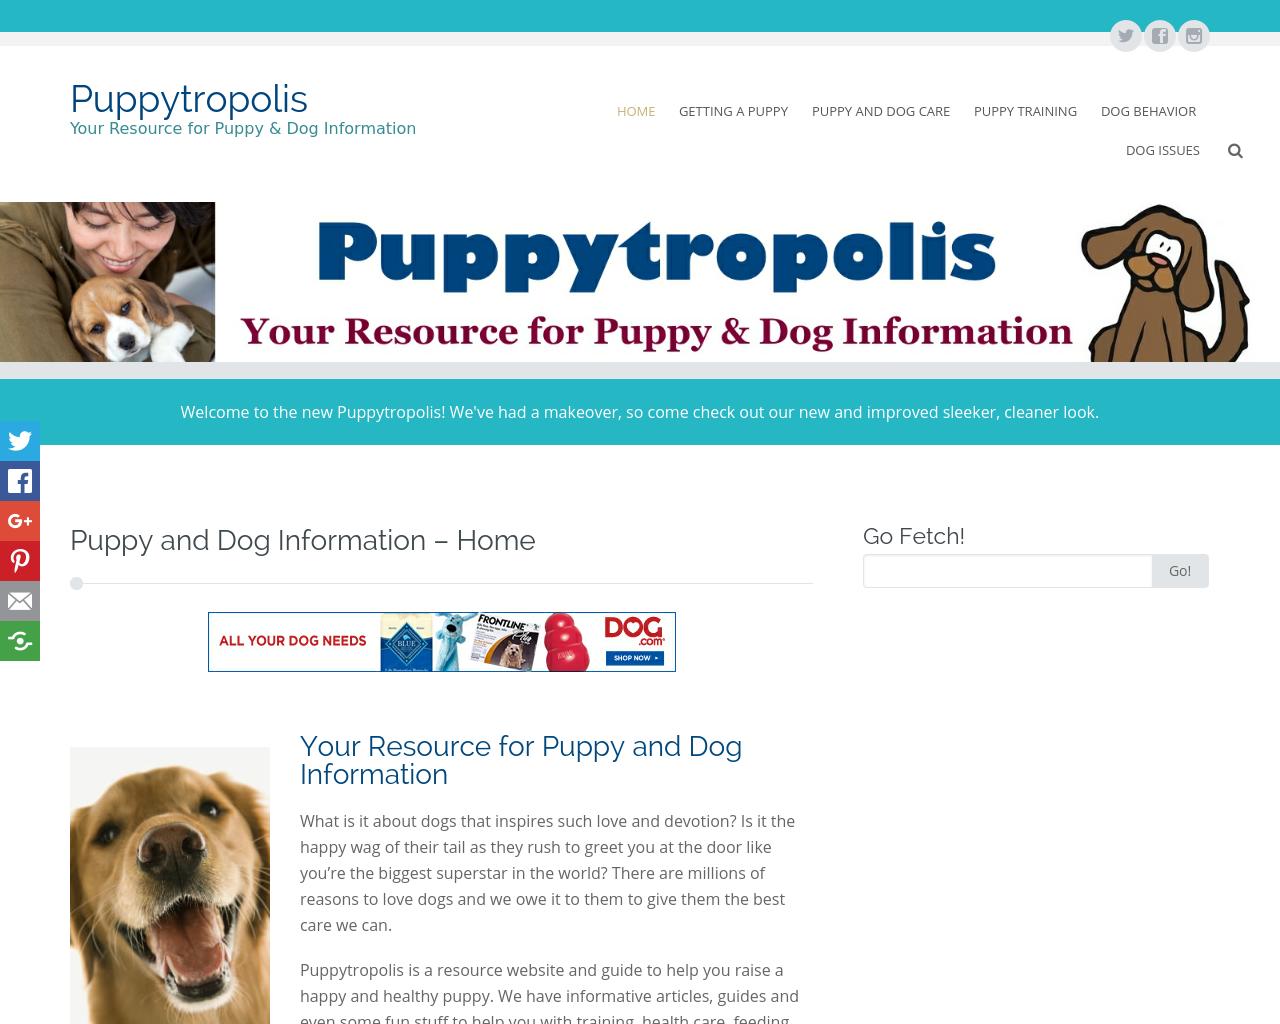 Puppytropolis-Advertising-Reviews-Pricing